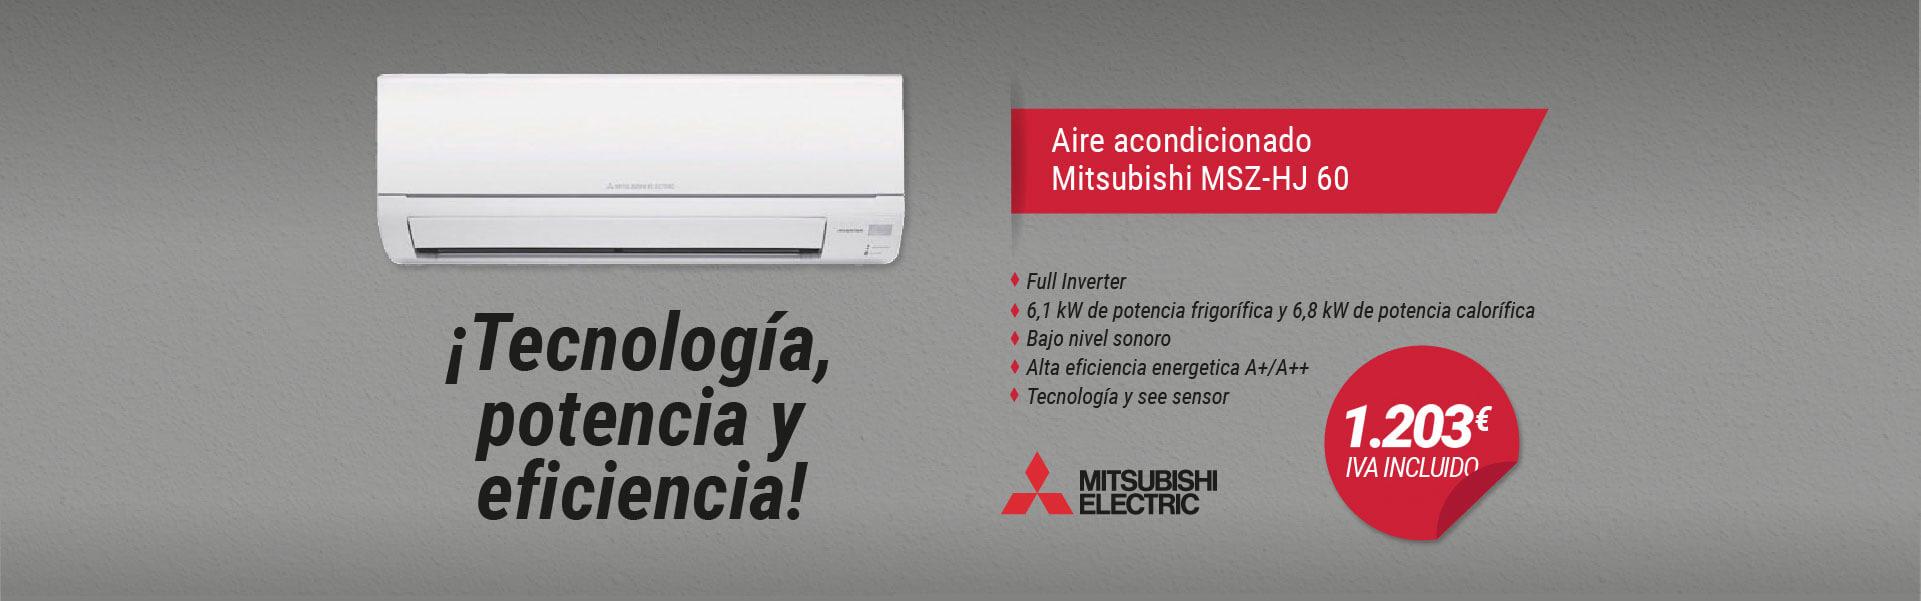 slider promo aire acondicionado Mitsubishi